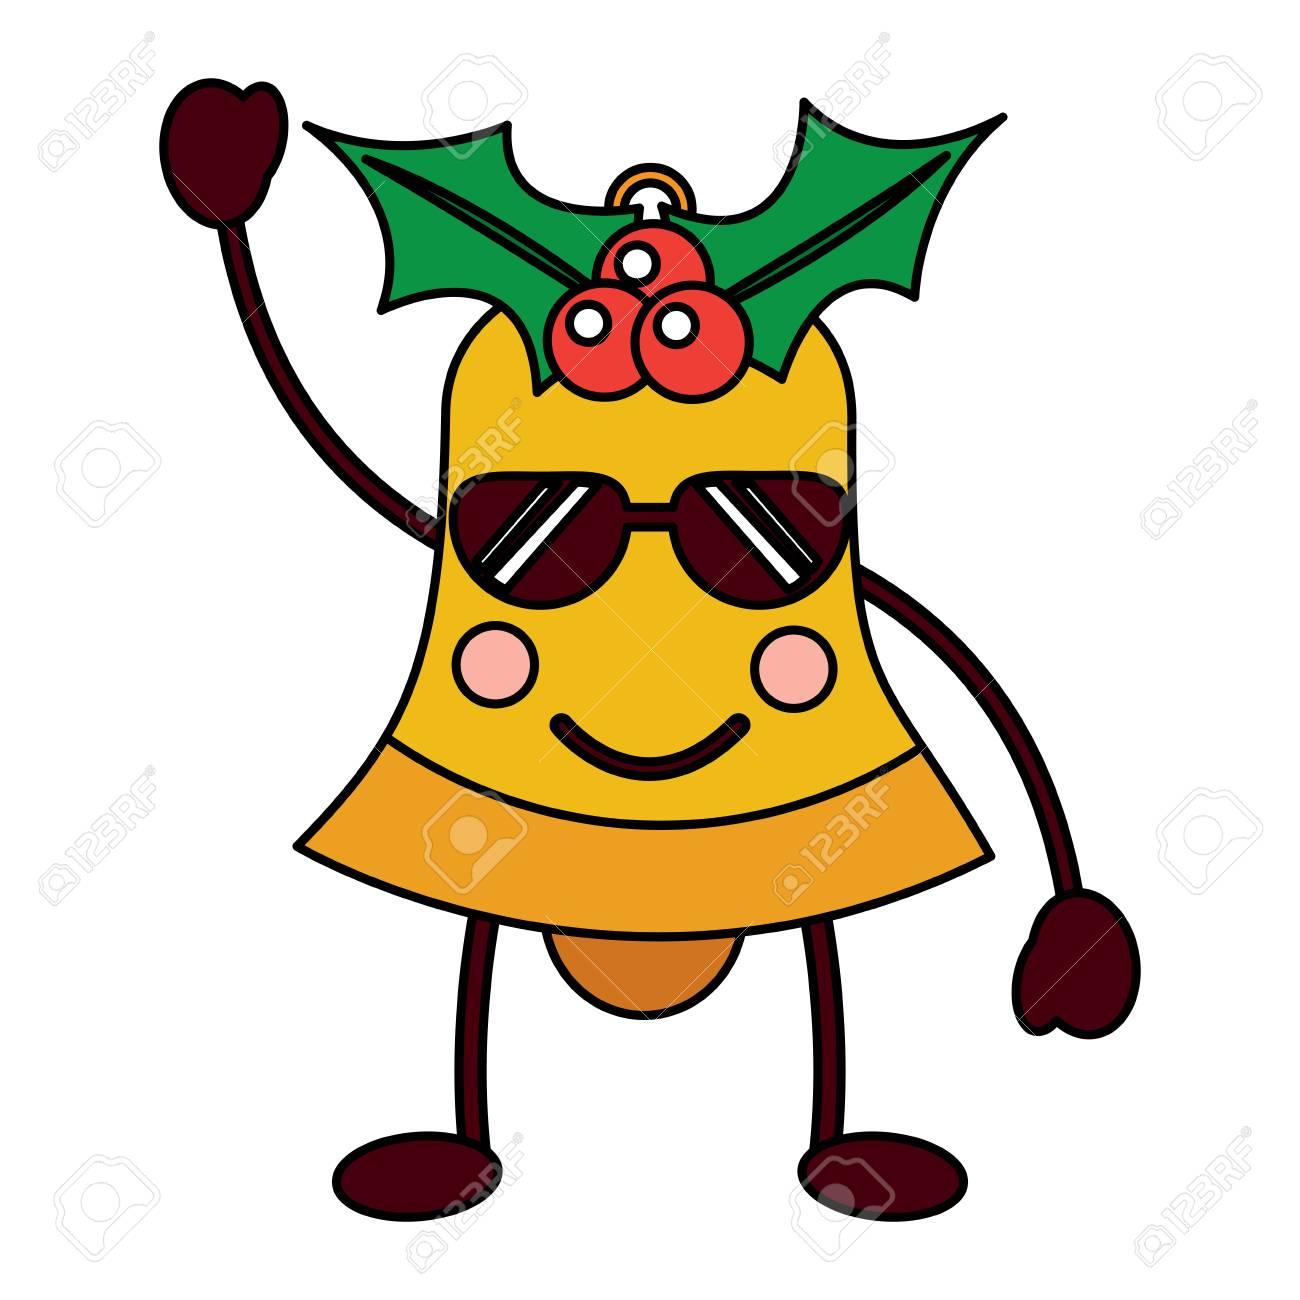 Kawaii Christmas Jingle Bell Cartoon Vector Illustration Royalty ...